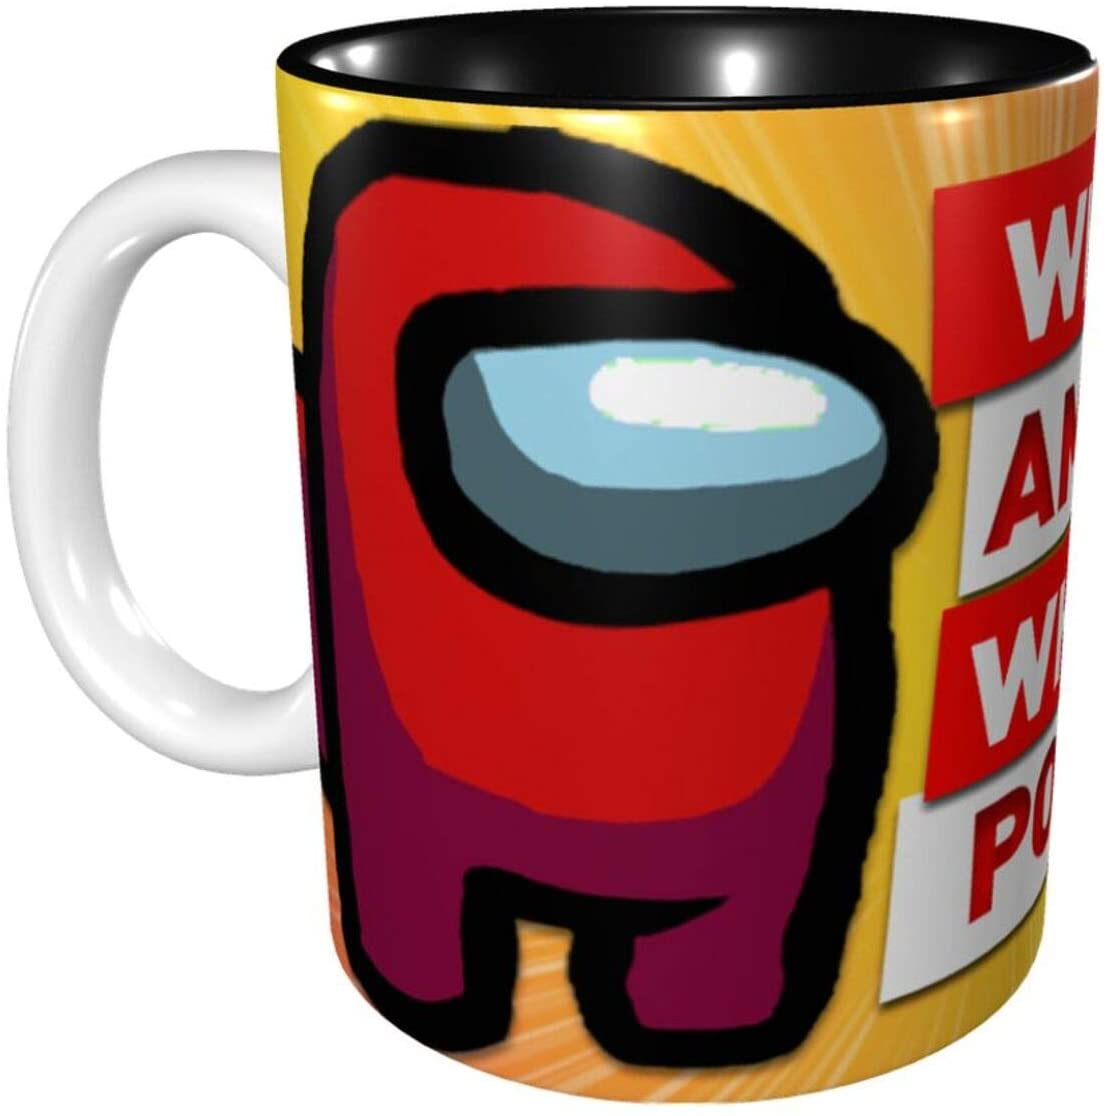 Among Us Impostor Coffee Mug Sus Meme Among Us Game Imposter Merch Black Ceramic Coffee Mug/Tea Cup 11oz